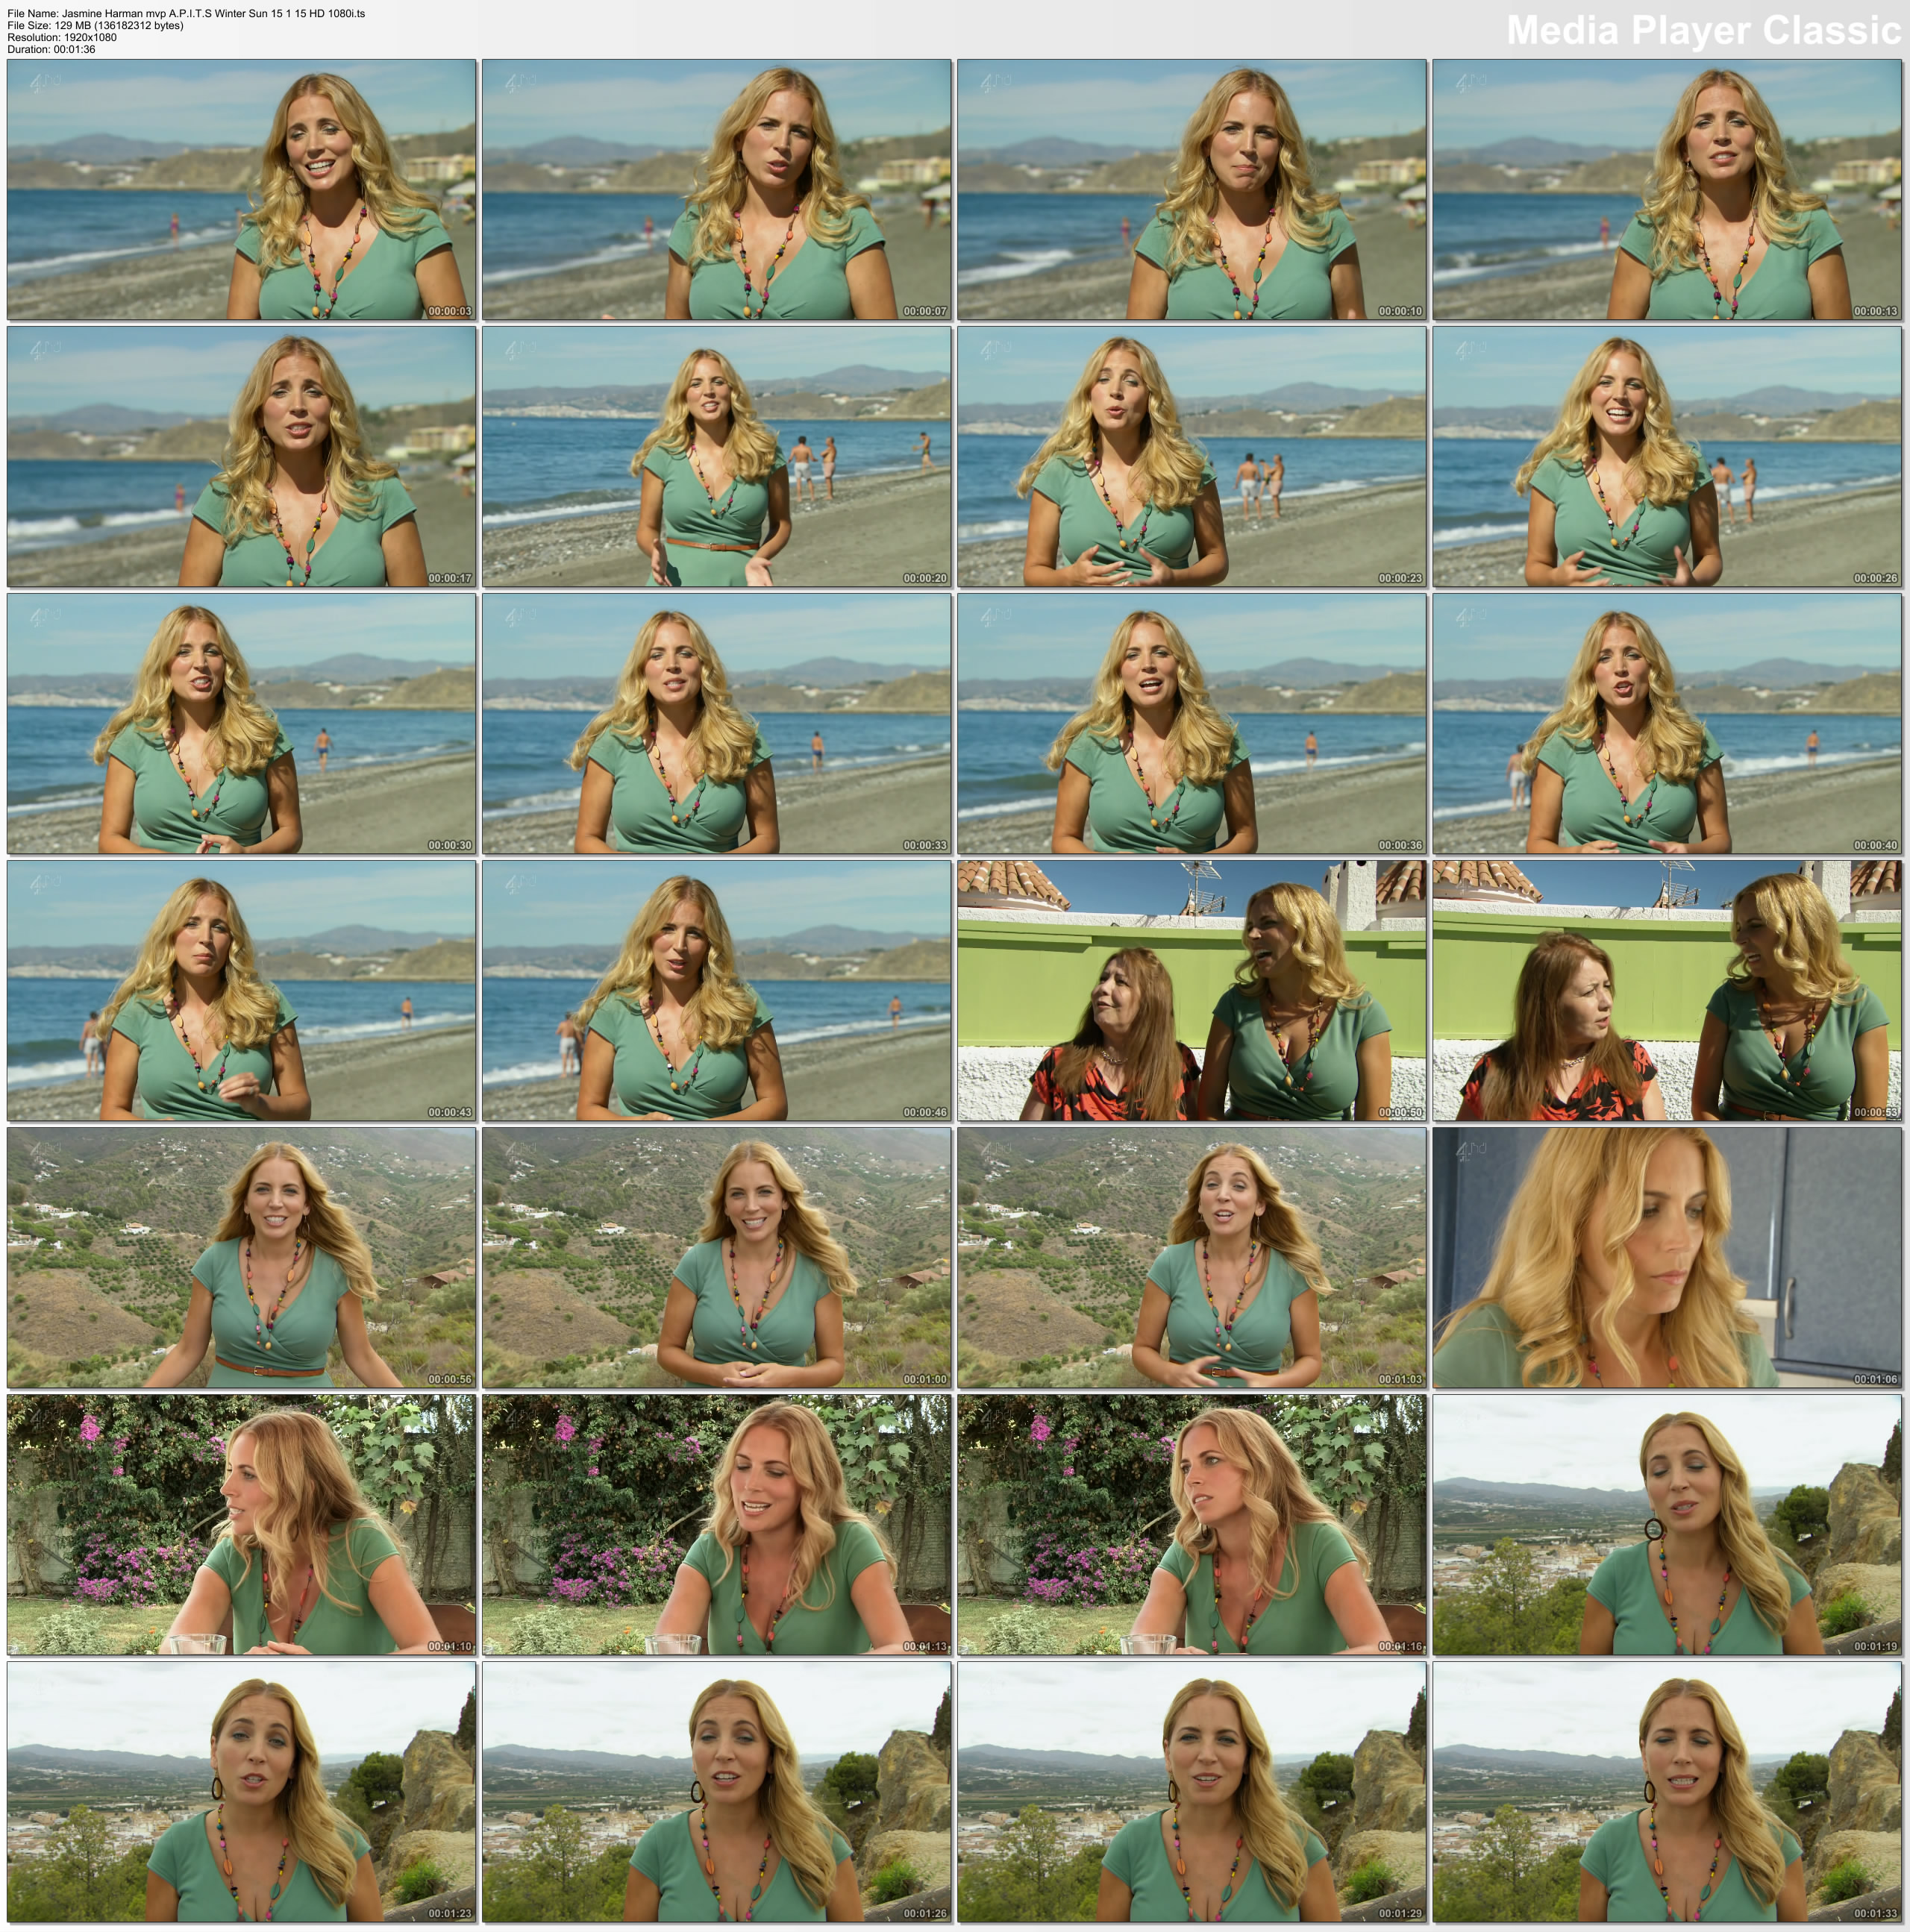 Jasmine Harman mvp A.P.I.T.S Winter Sun 15 1 15 HD 1080i.ts_thumbs.jpg